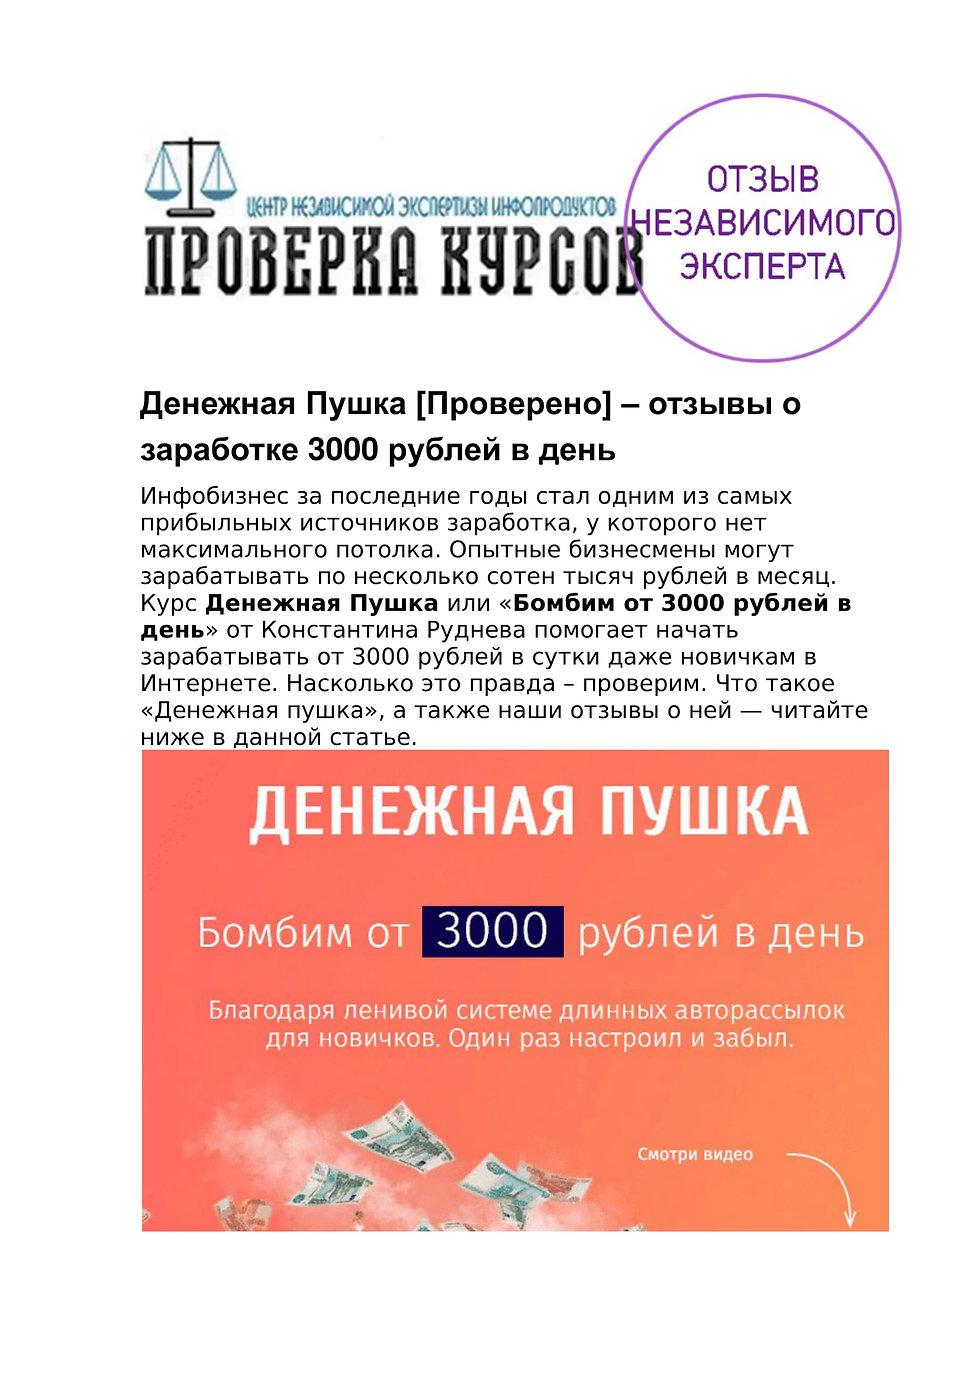 ДенежнаяПушка.jpg